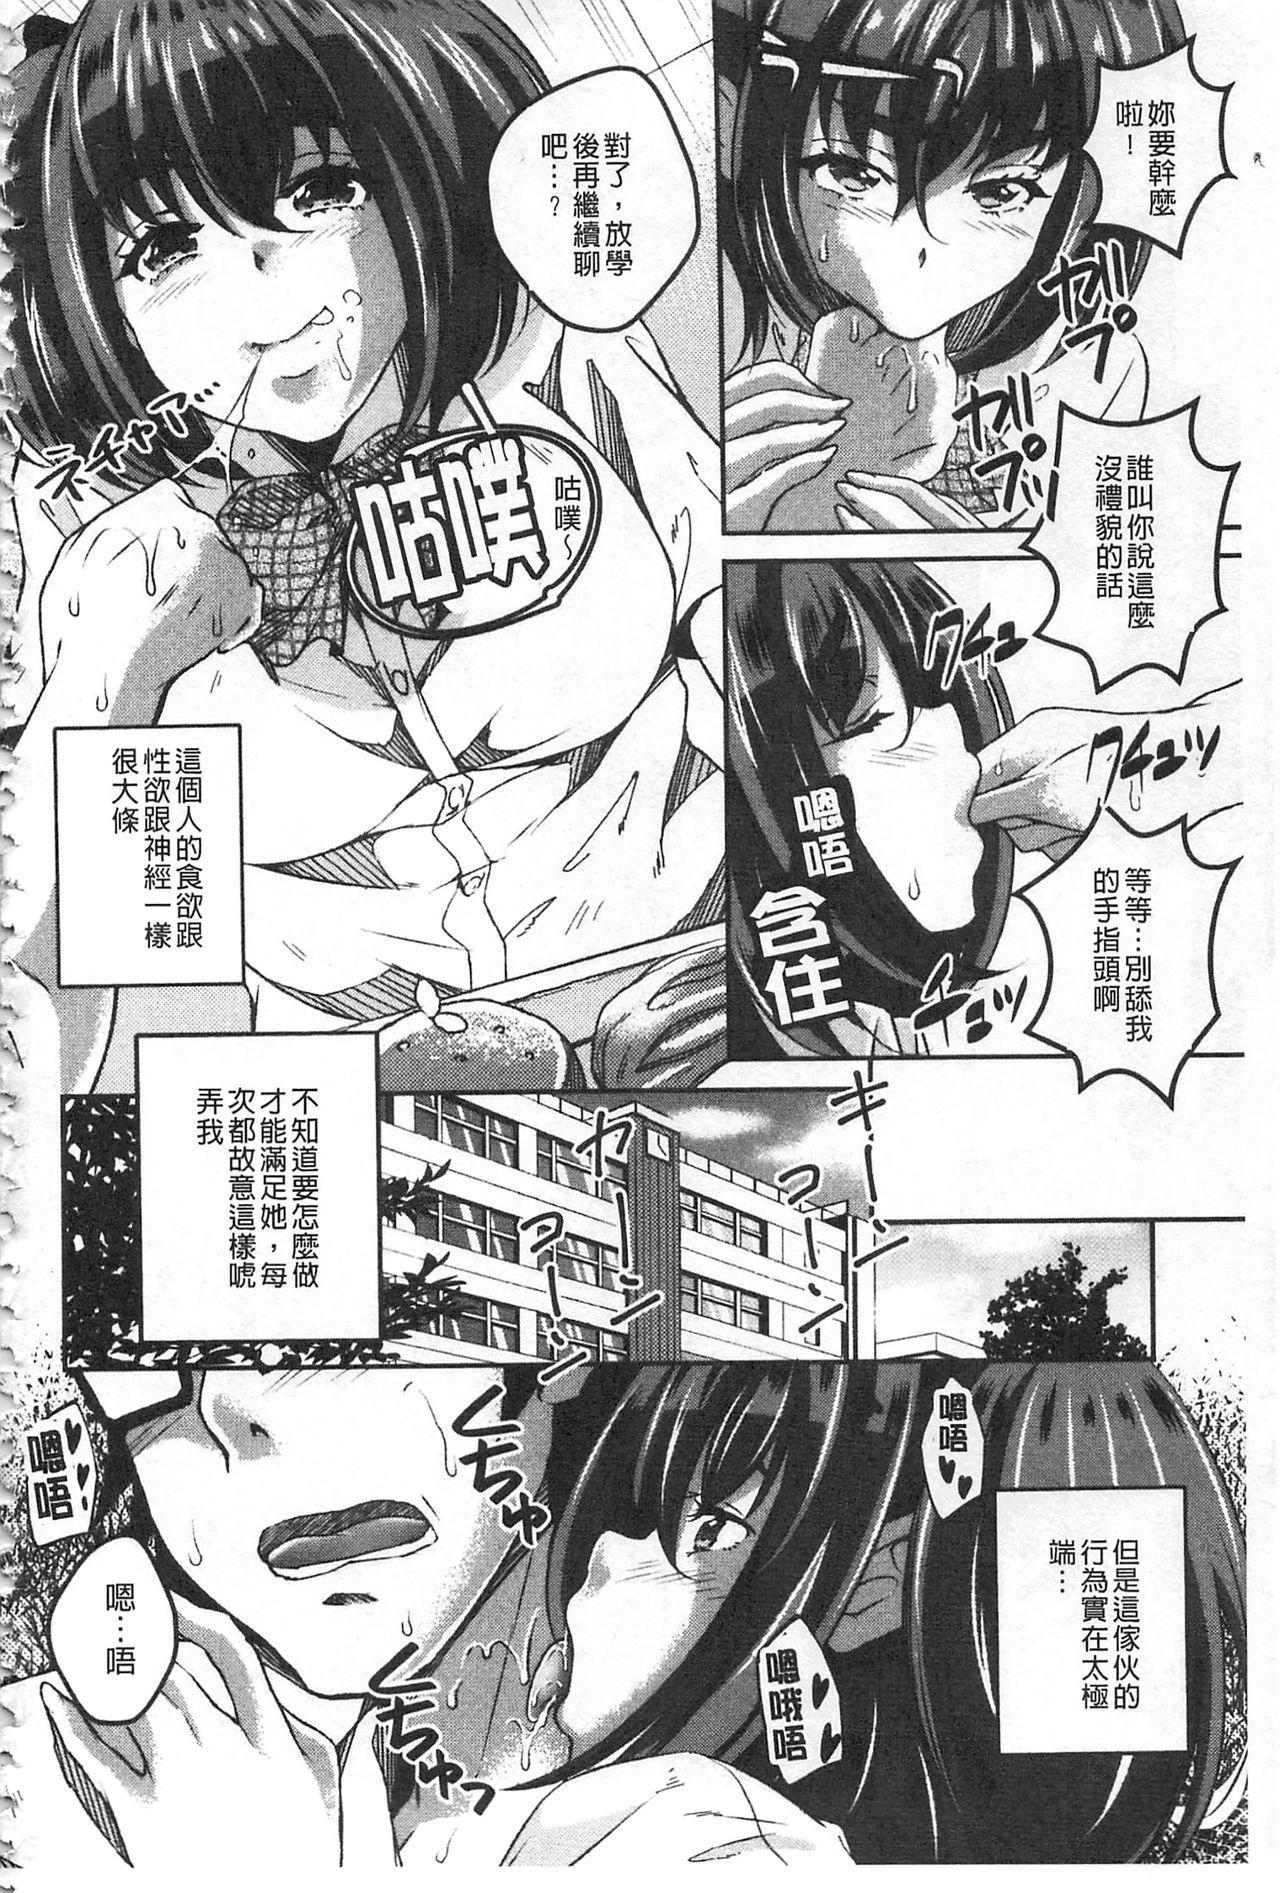 Kanjuku Otome no Odoshikata | 姦熟乙女的脅迫法 101